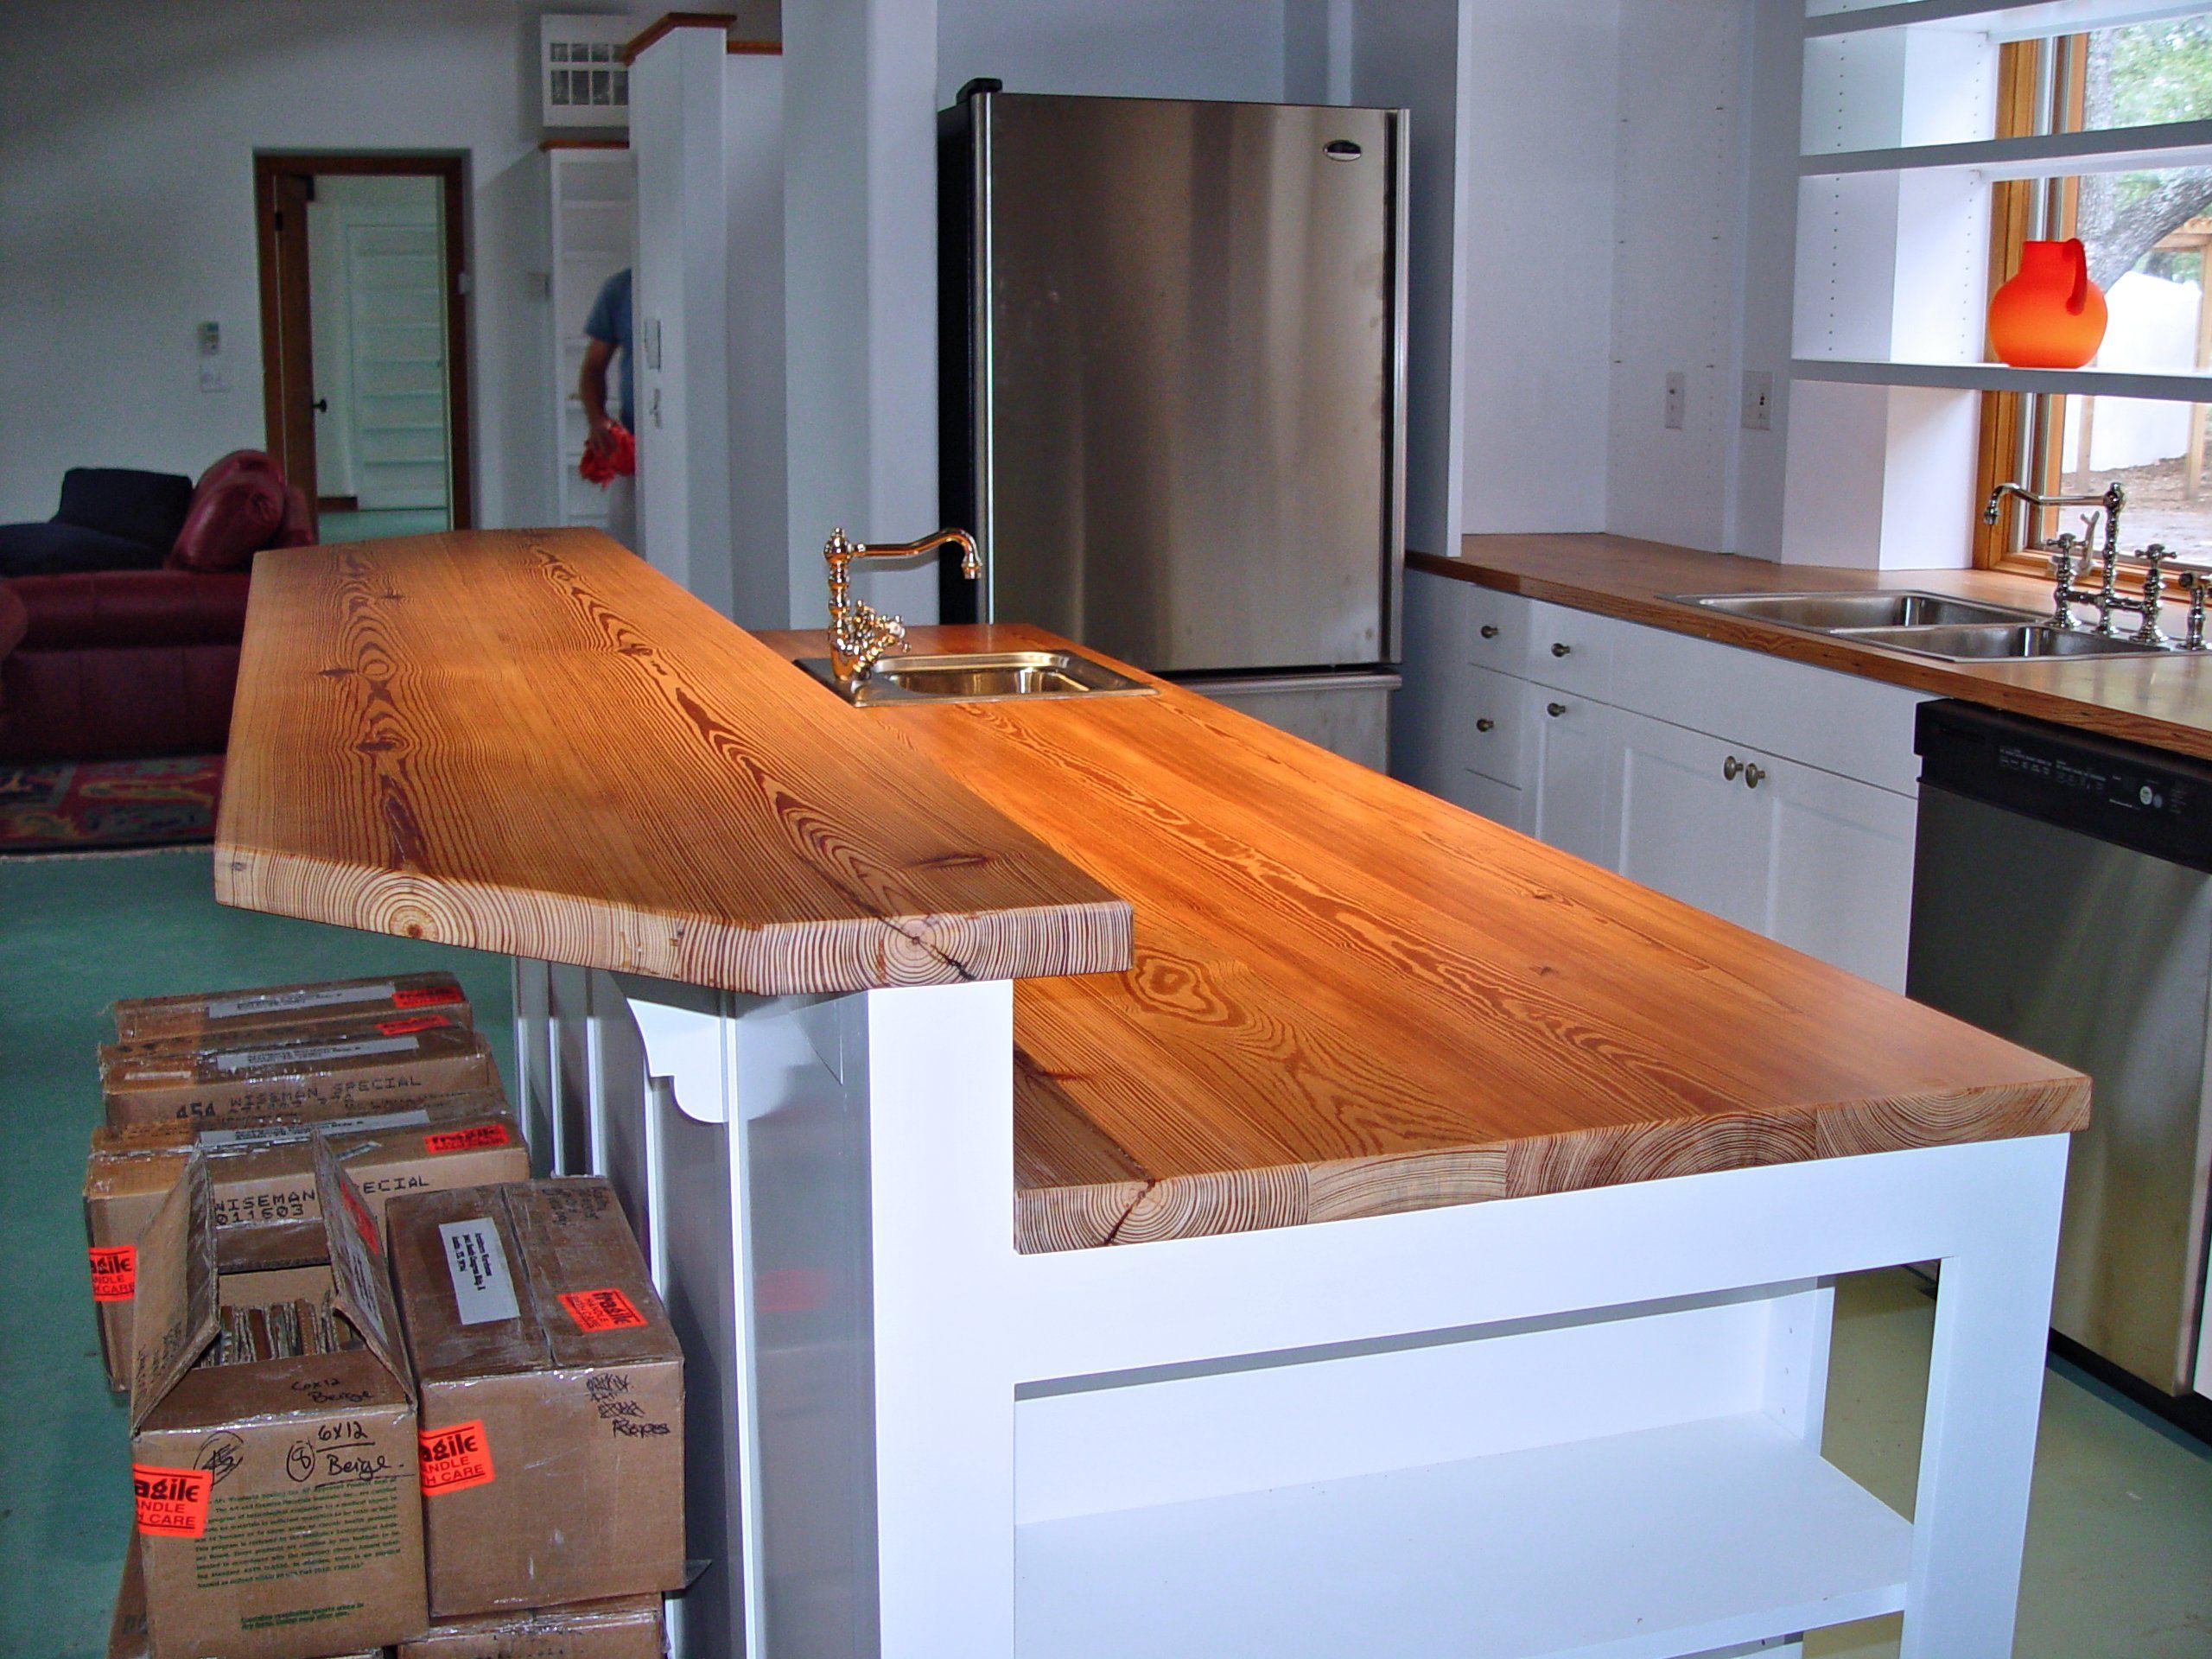 Reclaimed Longleaf Pine Wood Countertop Photo Gallery By